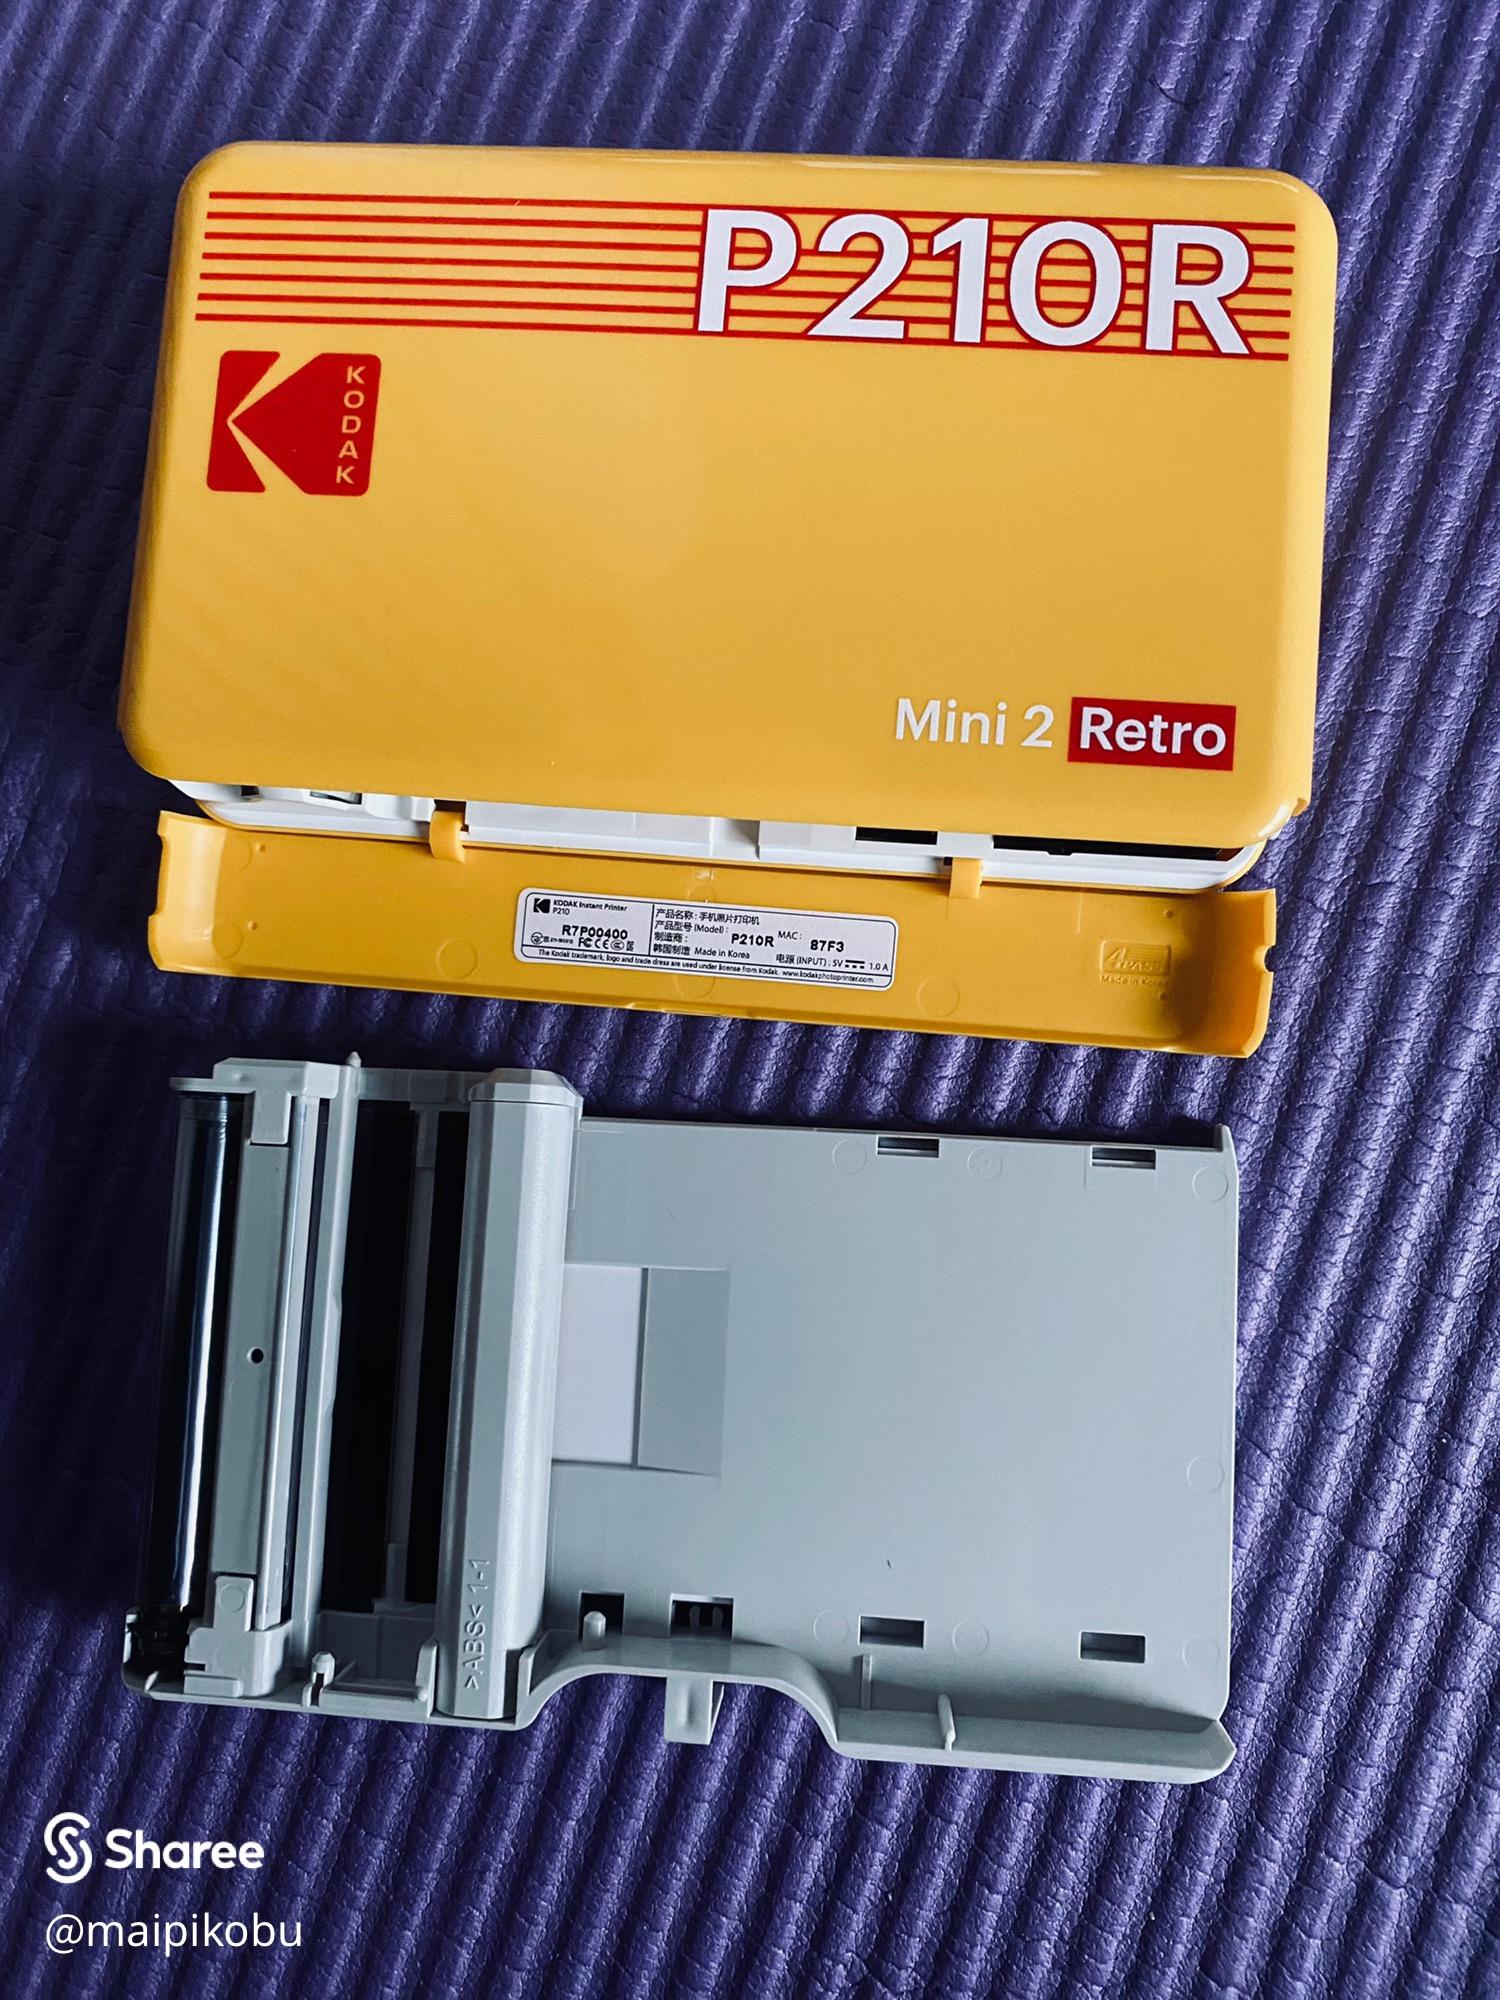 KODAK MiniレトロP21OR 14,900円の良い点・メリットに関するマイピコブーさんの口コミ画像2